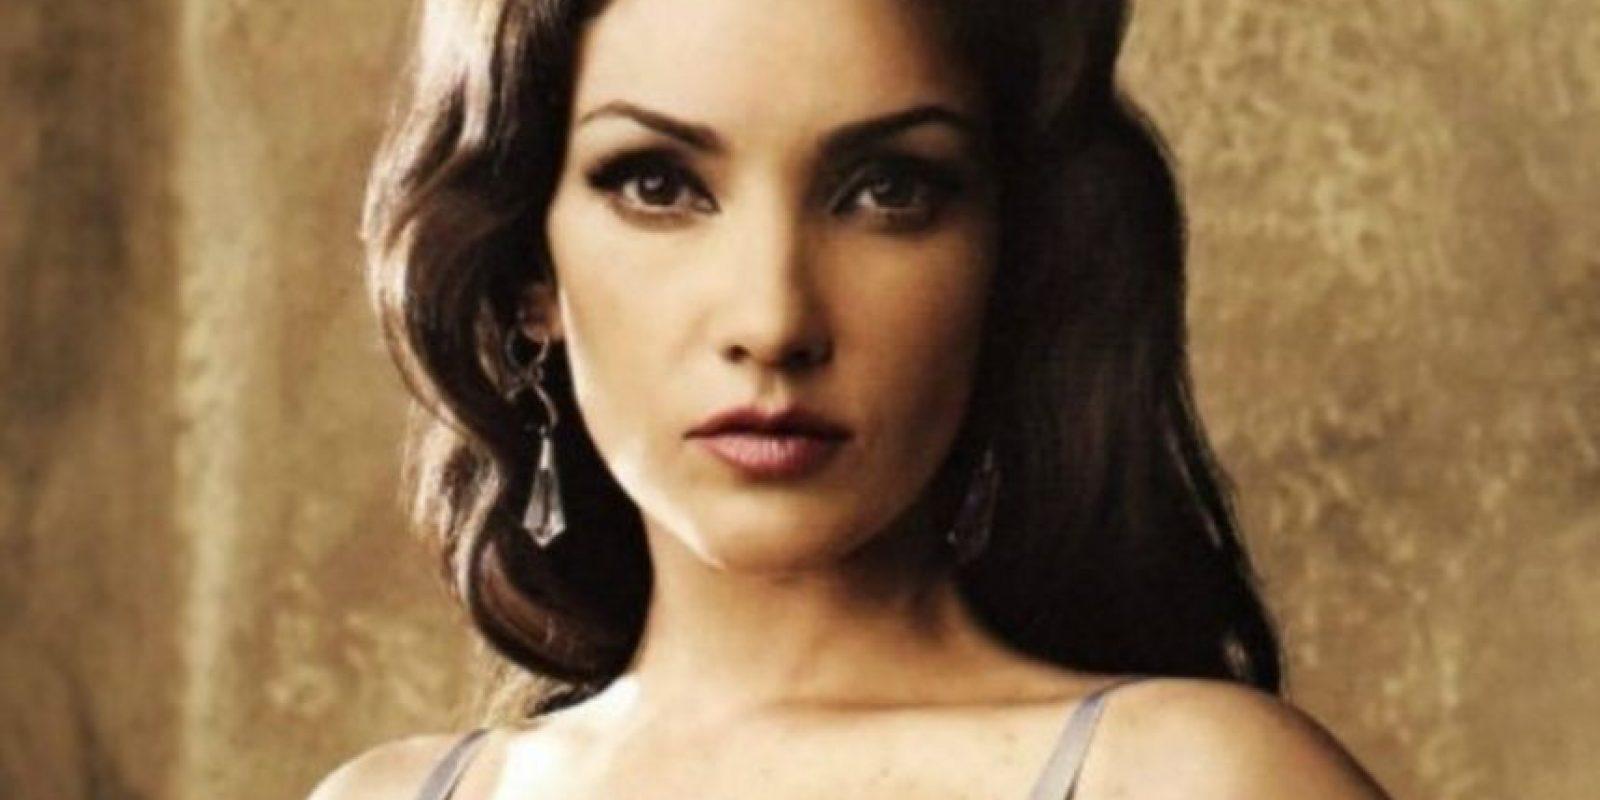 Karla Álvarez, la actriz falleció en noviembre de 2013 Foto:Vía twitter.com/alvarez_karla